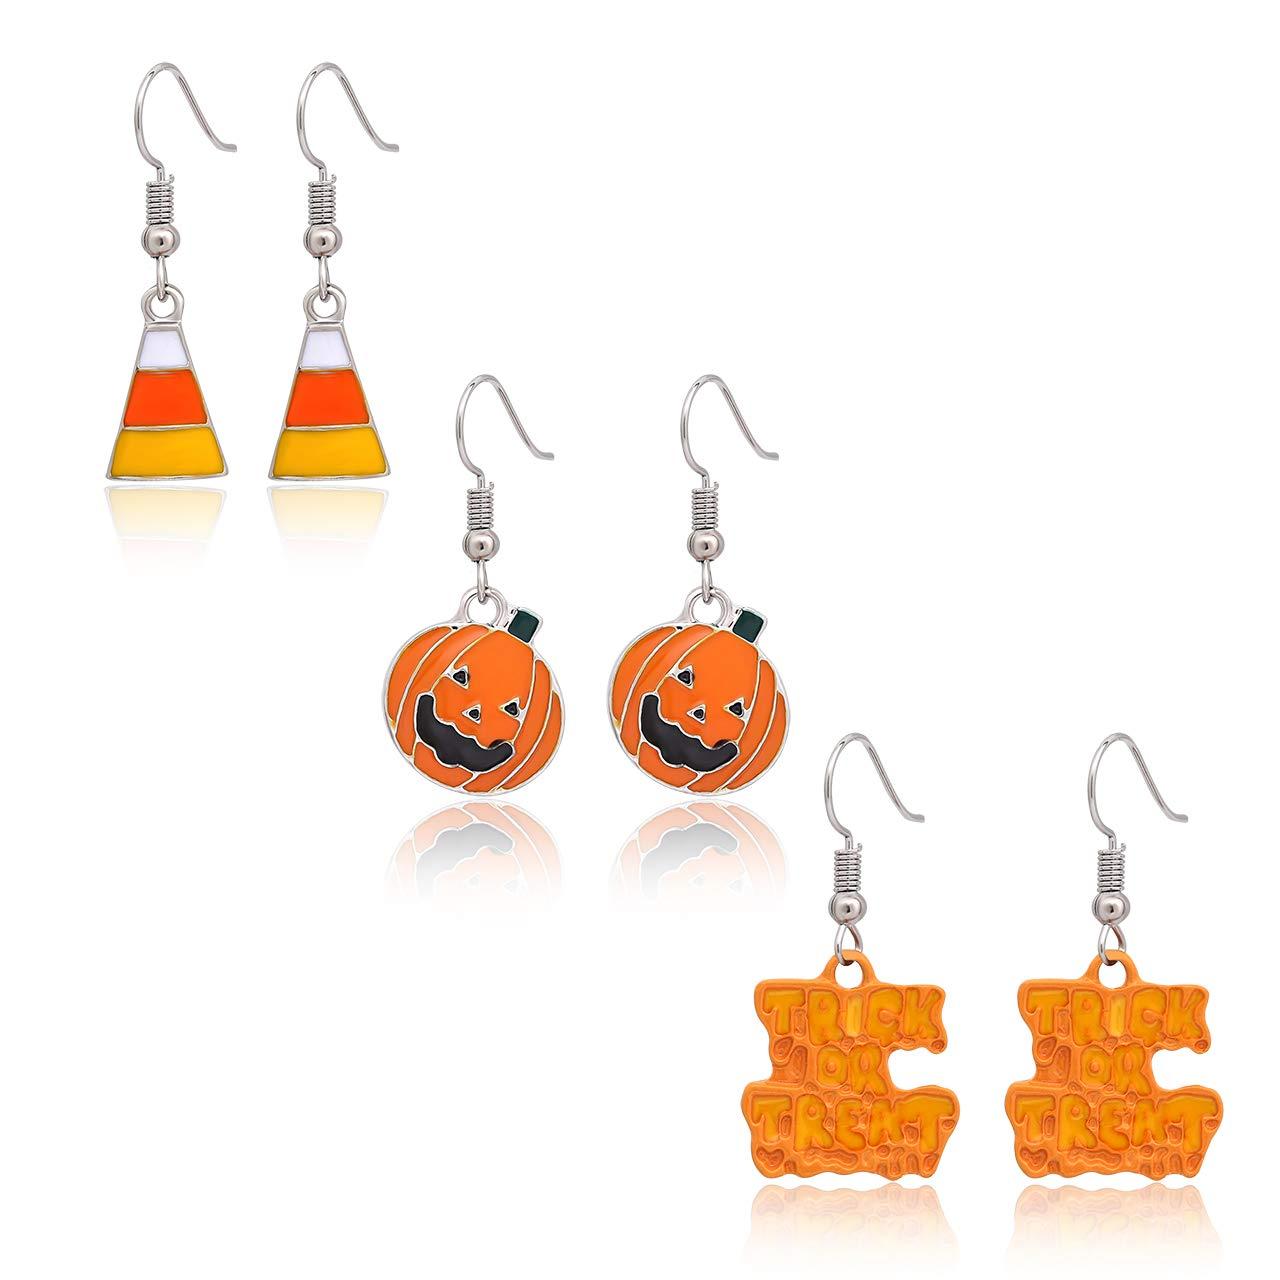 Halloween Jewelry 3 Pairs Halloween Drop Earrings Pumpkin Candy Corn Trick or Treat Trio Halloween Earrings Set Daxi